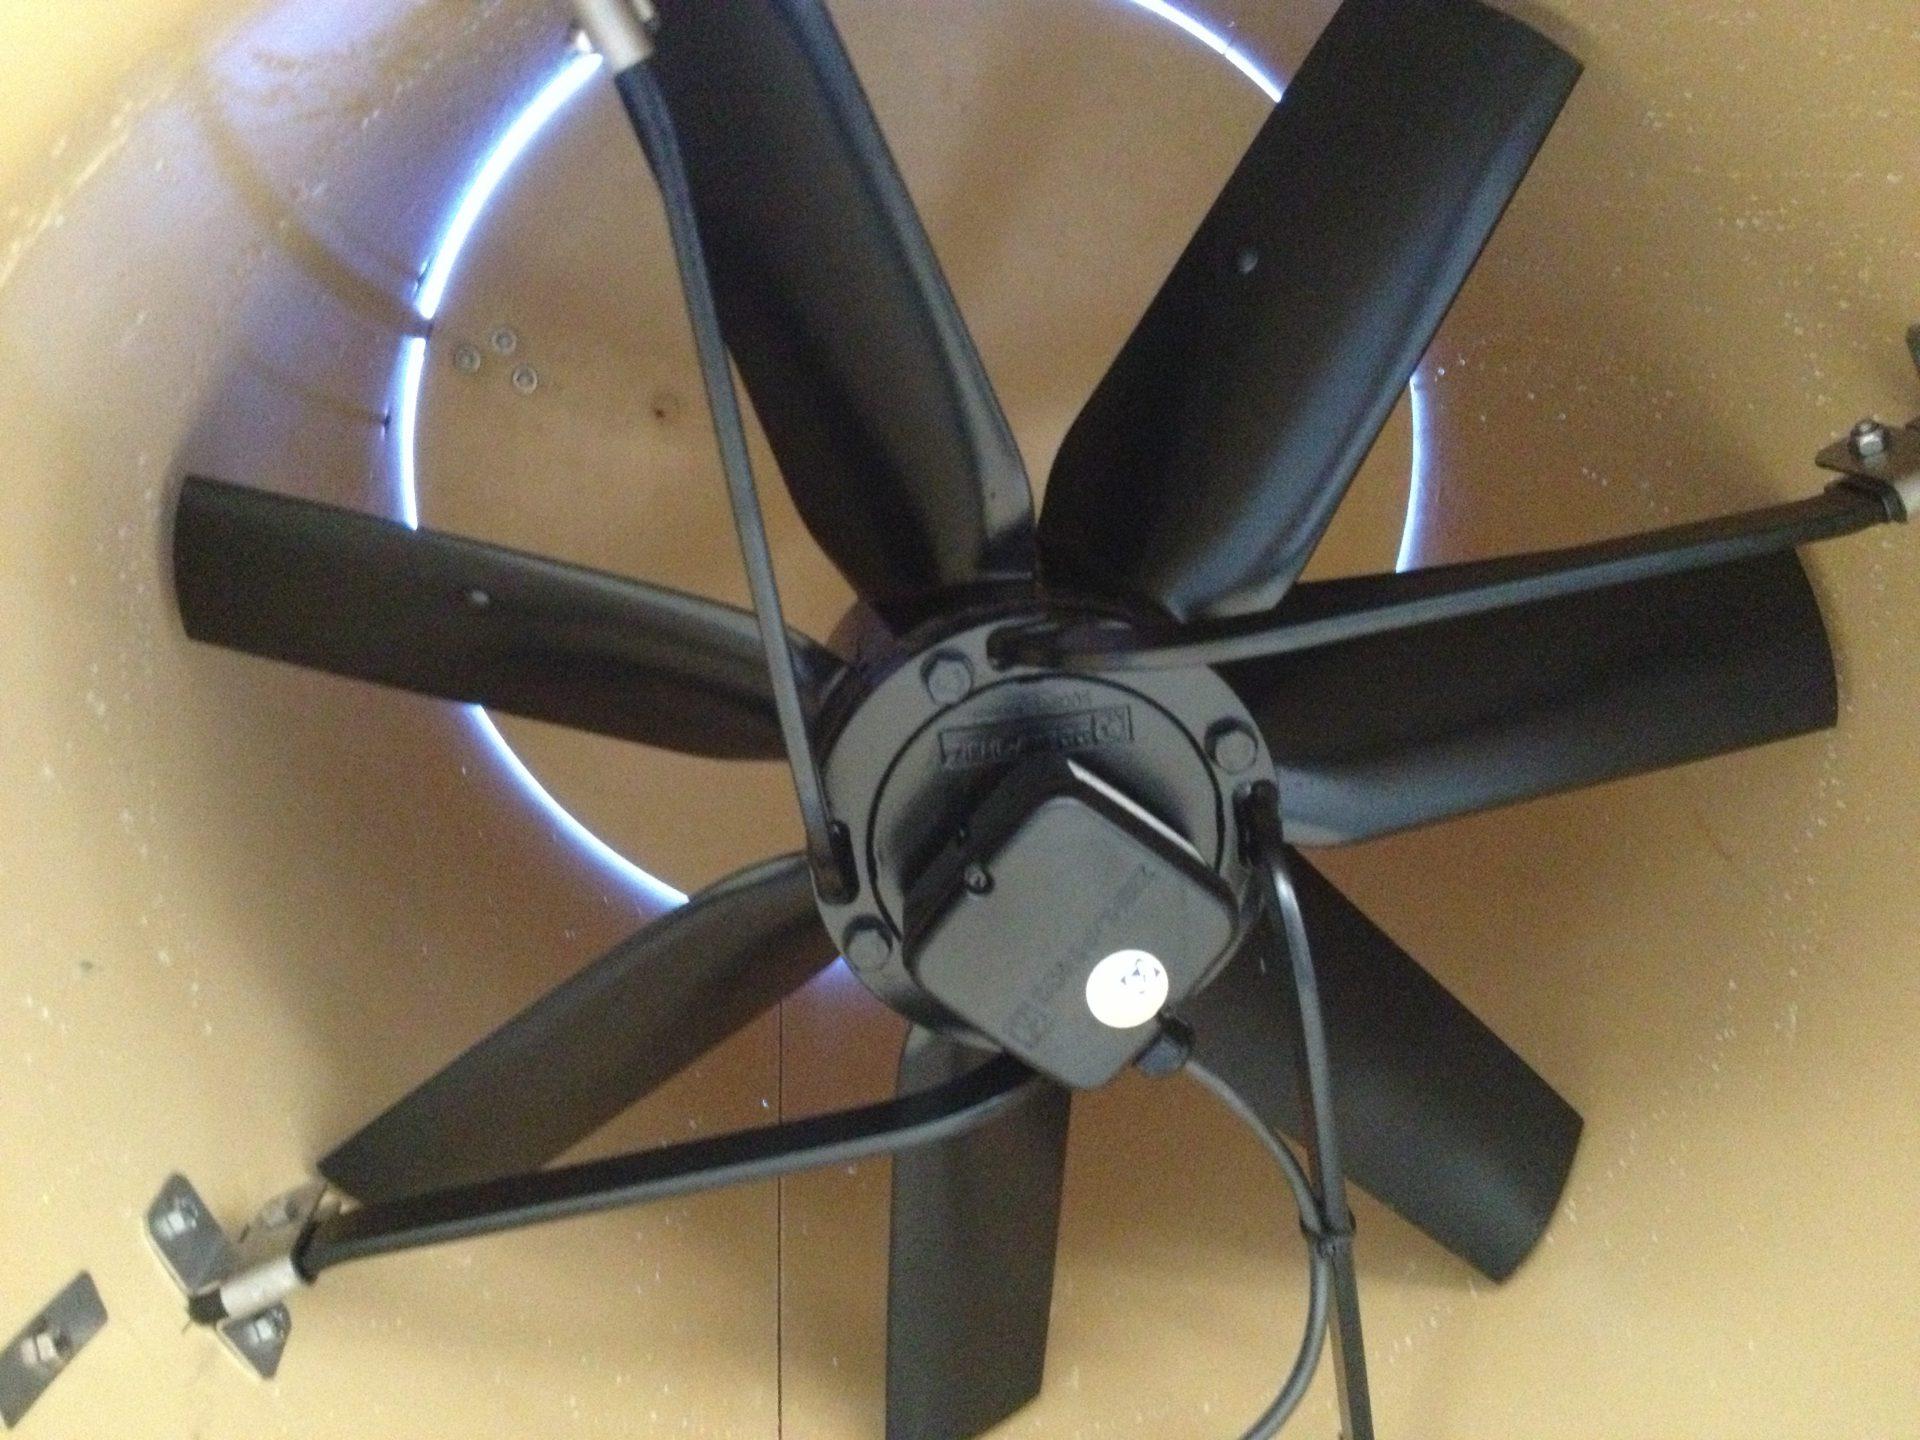 Ventilation chimney with fan